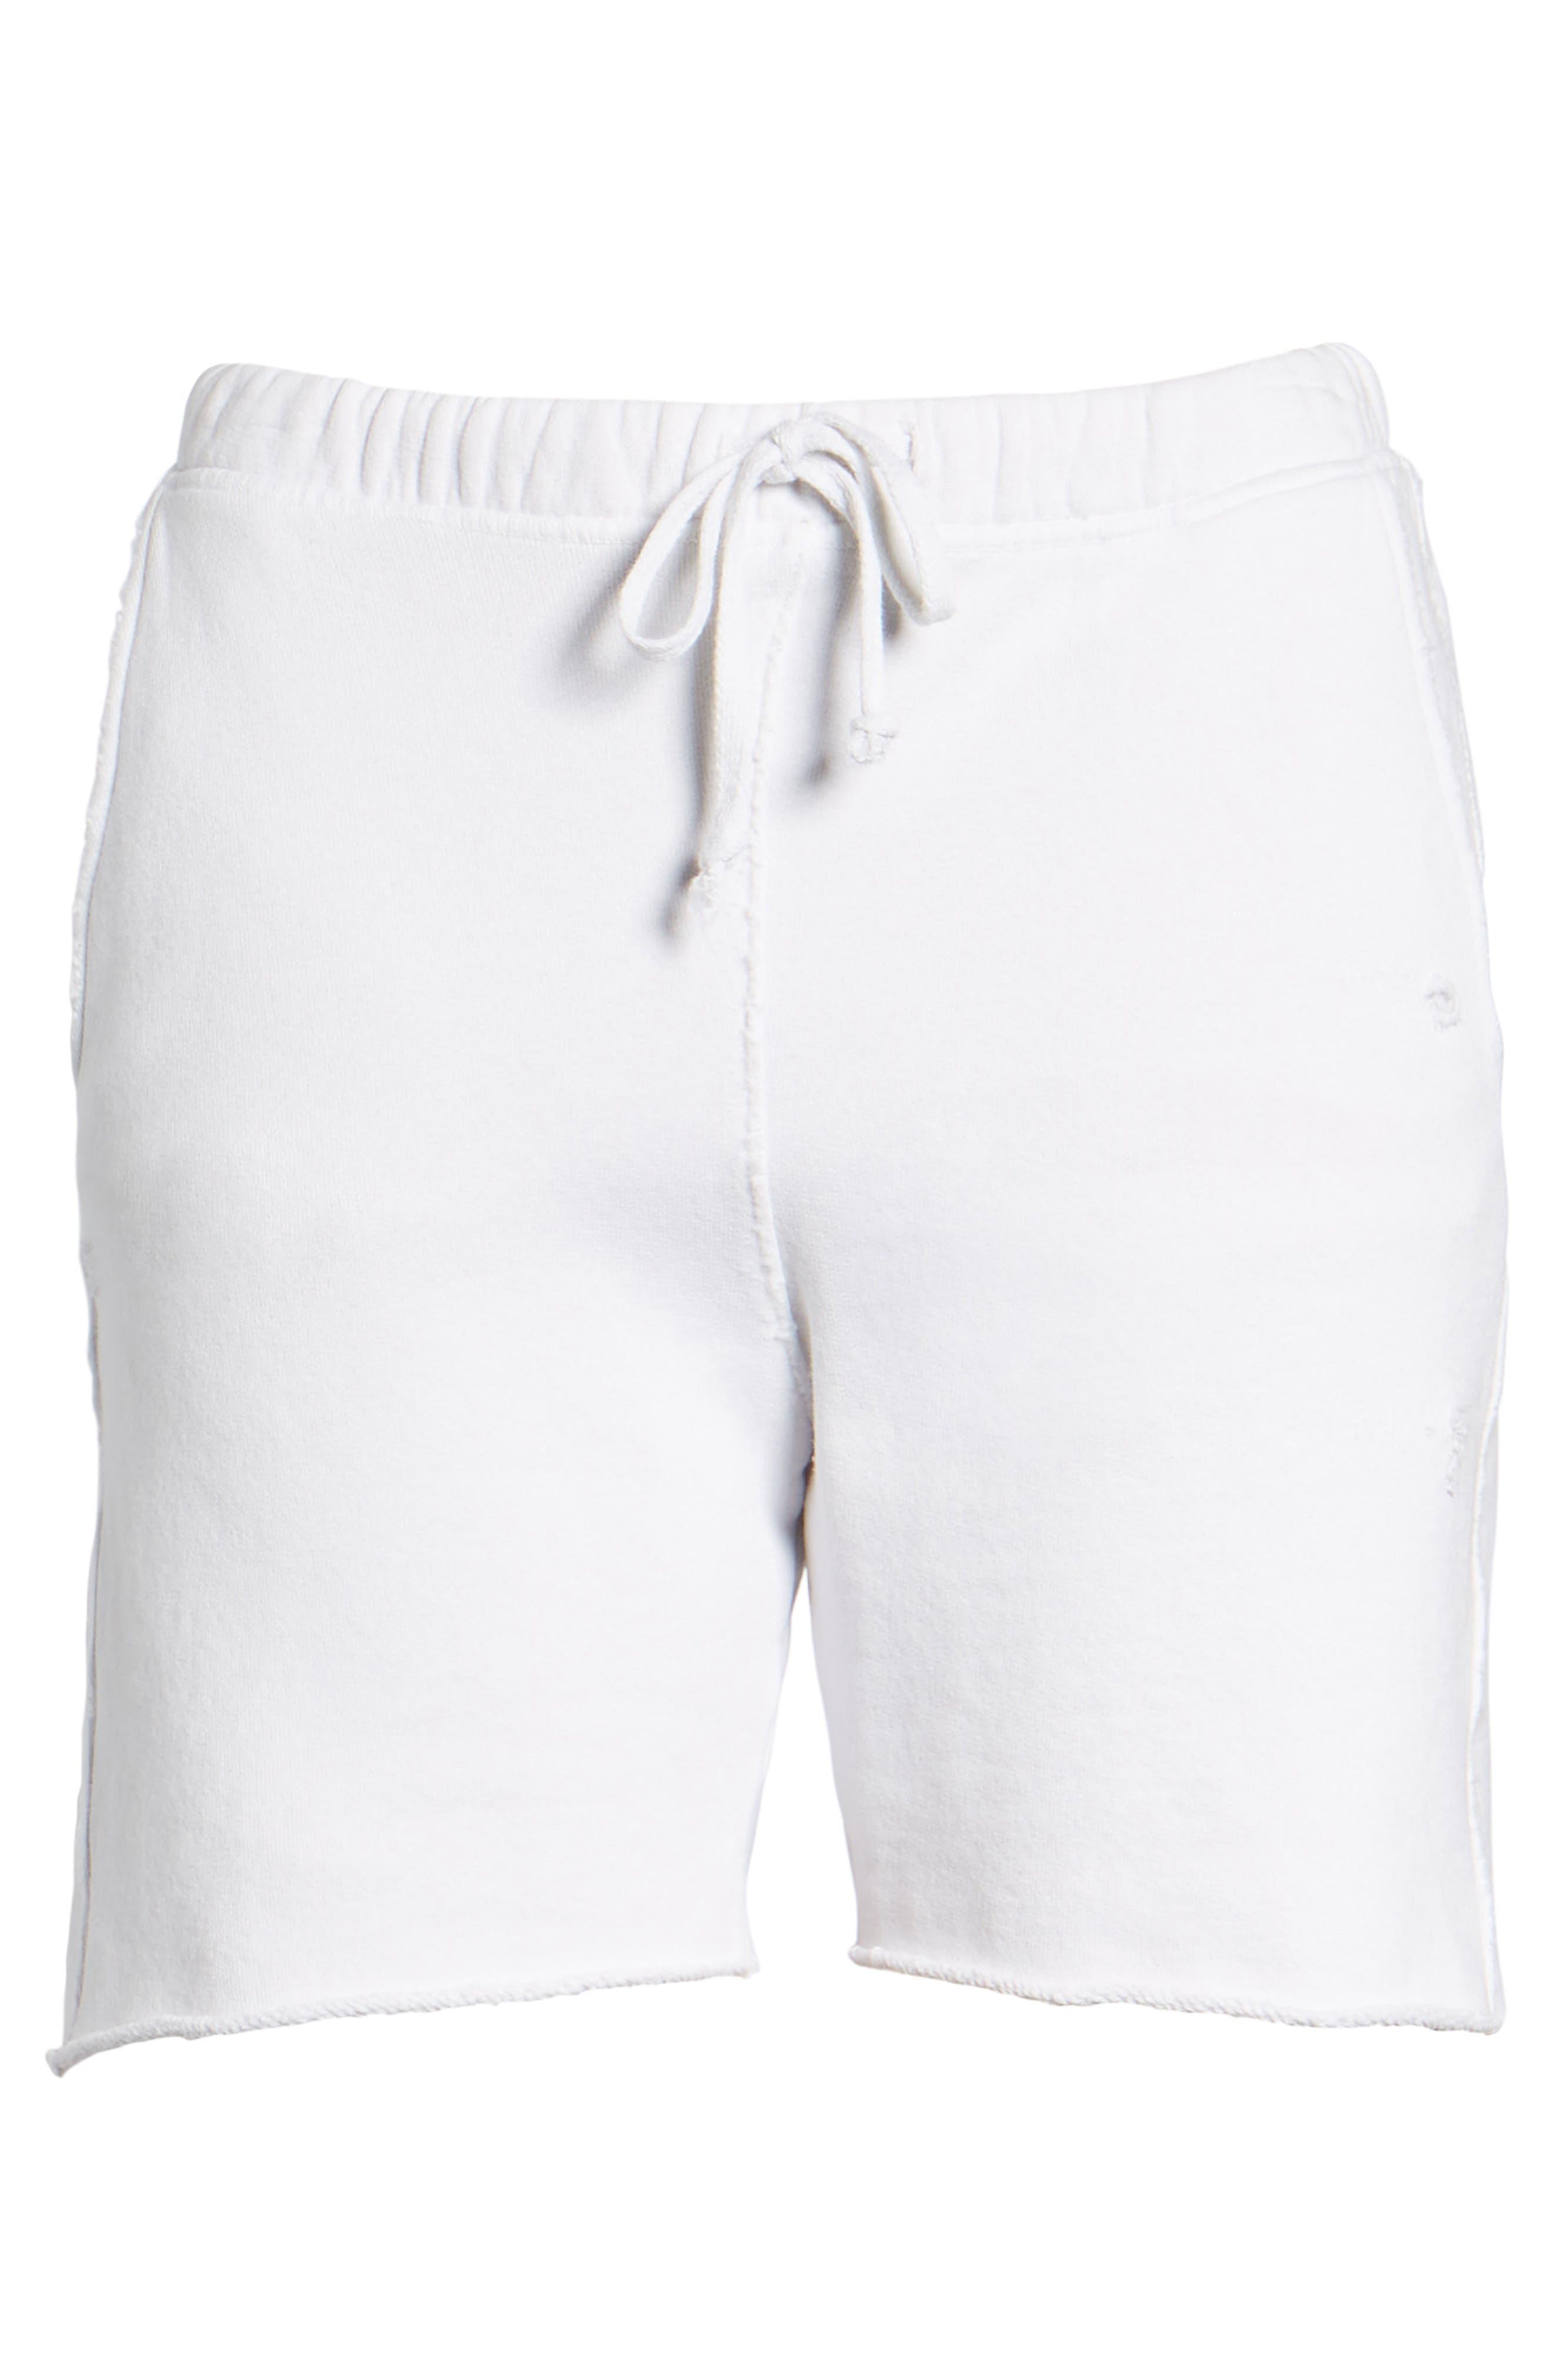 Fleece Shorts,                             Alternate thumbnail 6, color,                             Dirty White 10 Yr Vintage